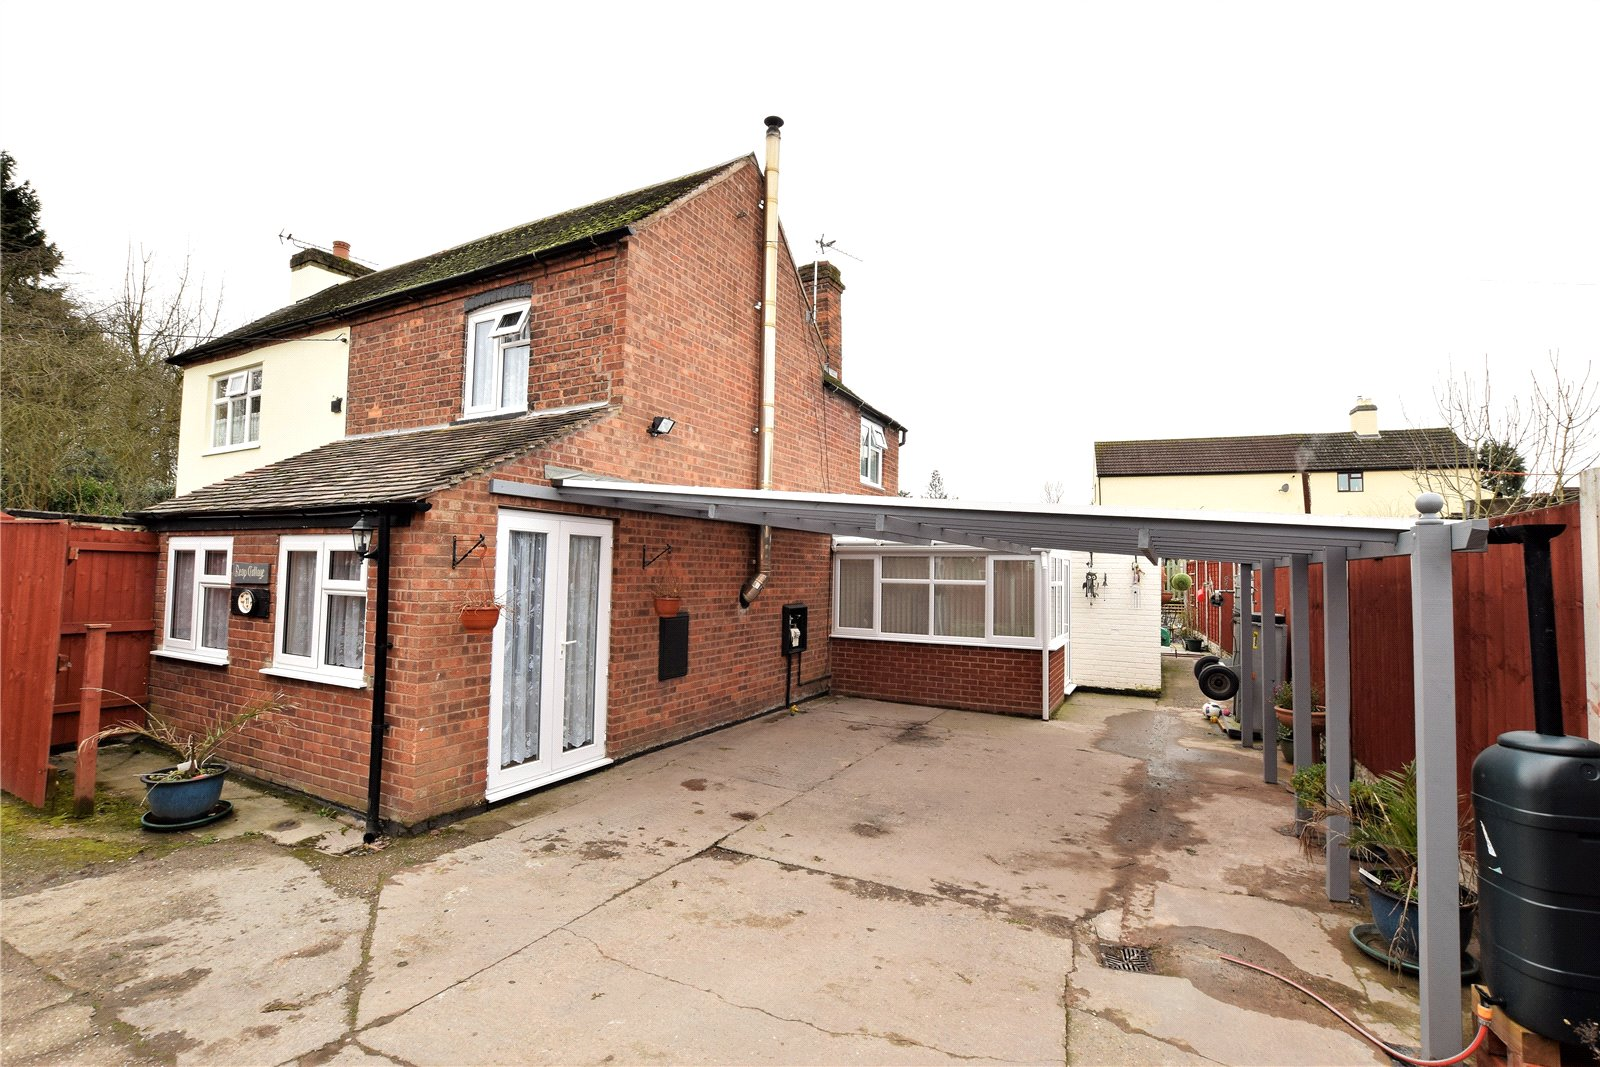 Reay Cottage, 11 Brandlee, Dawley, Telford, TF4